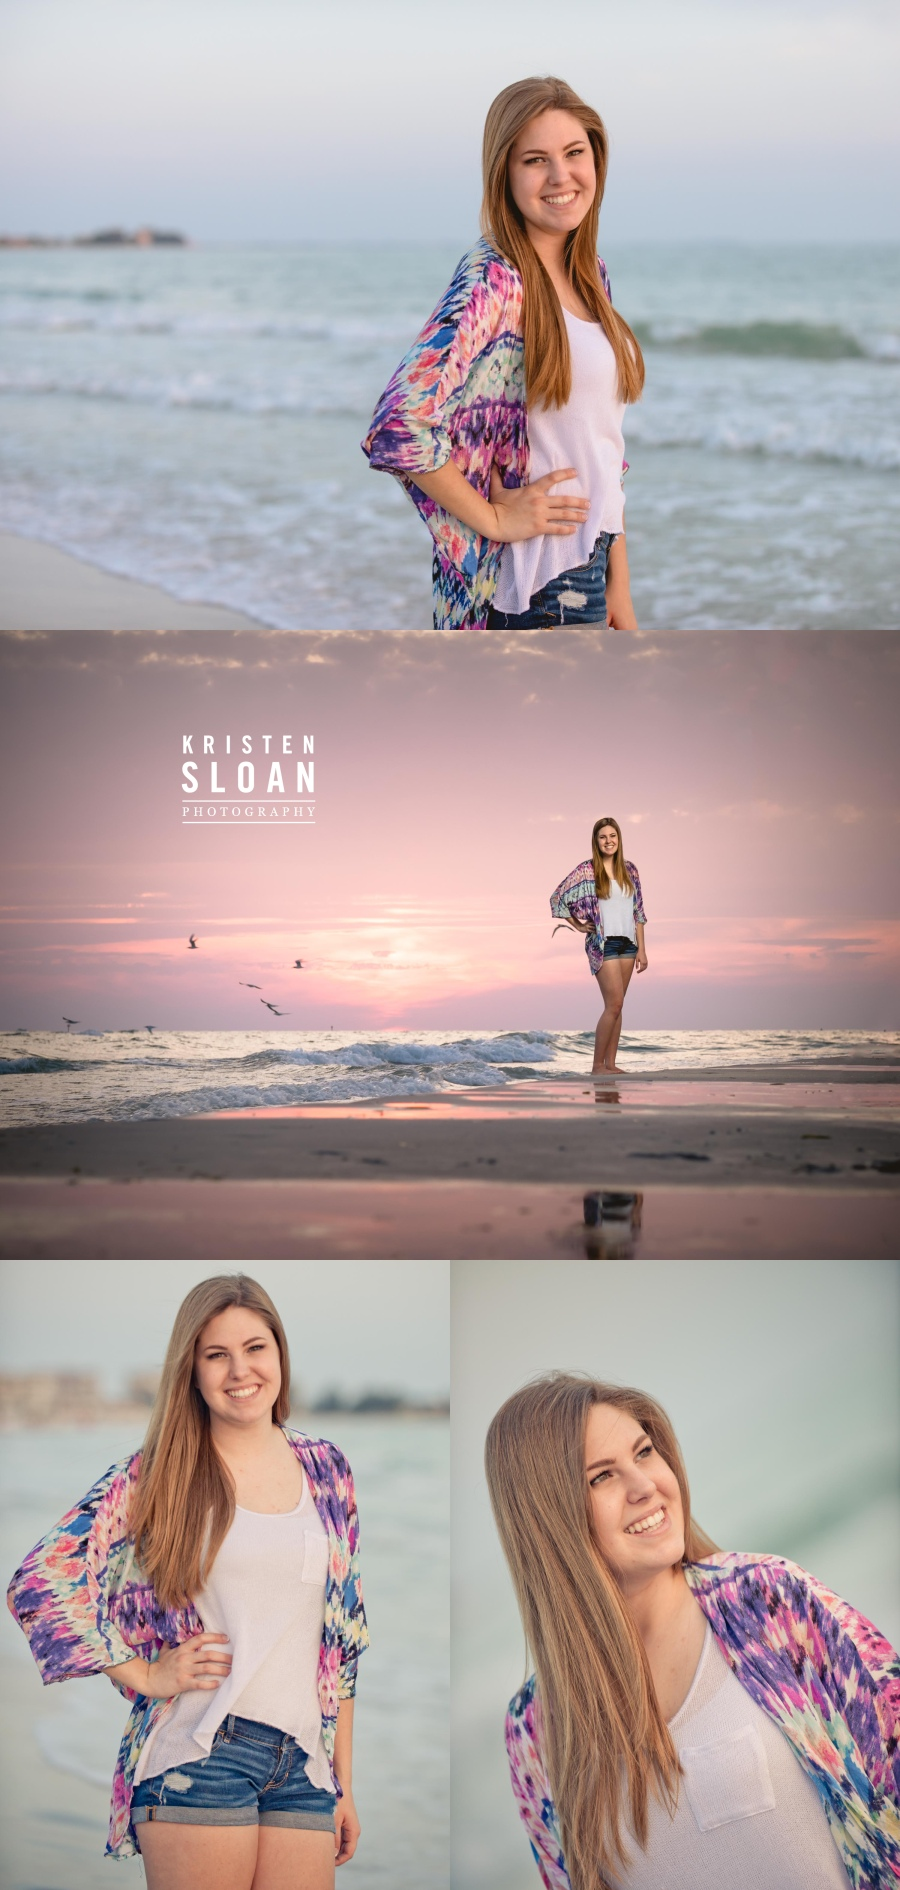 Treasure Island St Pete Beach Senior Portrait Photos by Kristen Sloan Photography